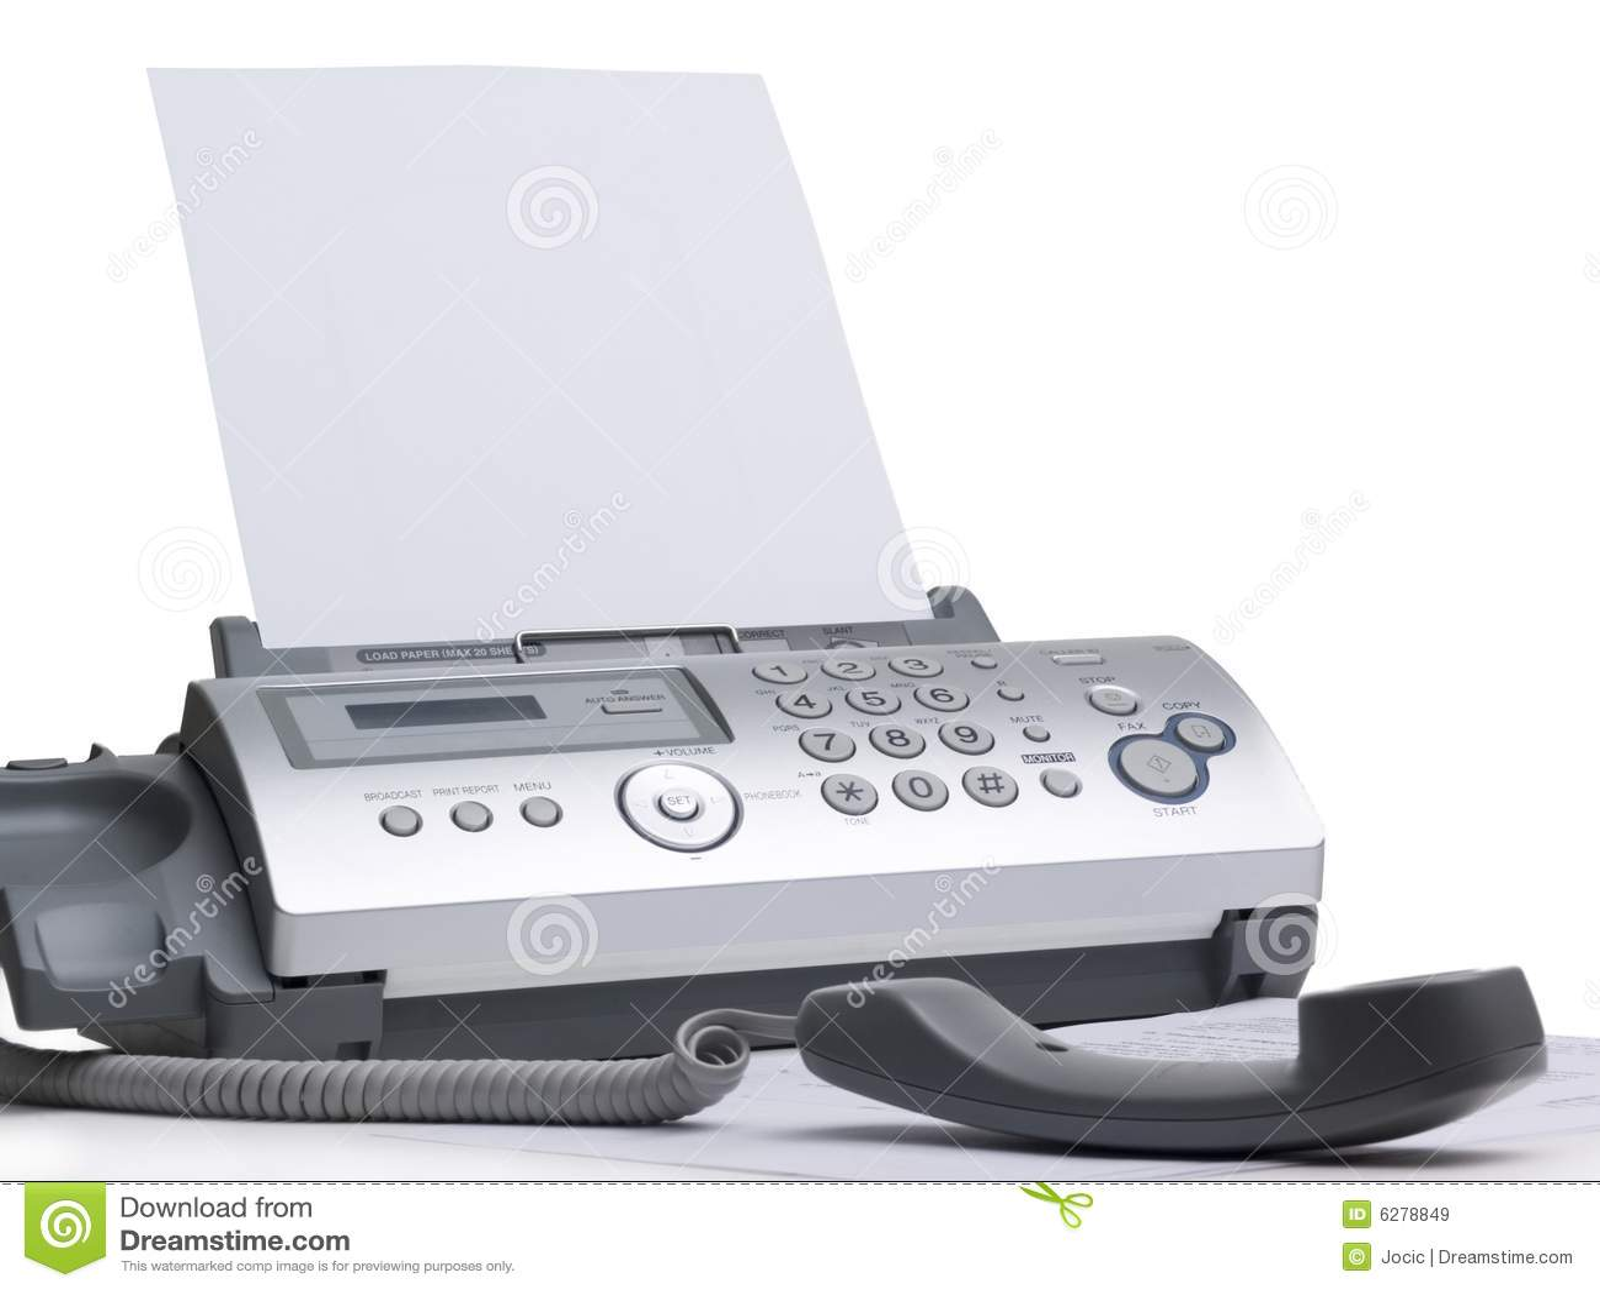 fax machine free